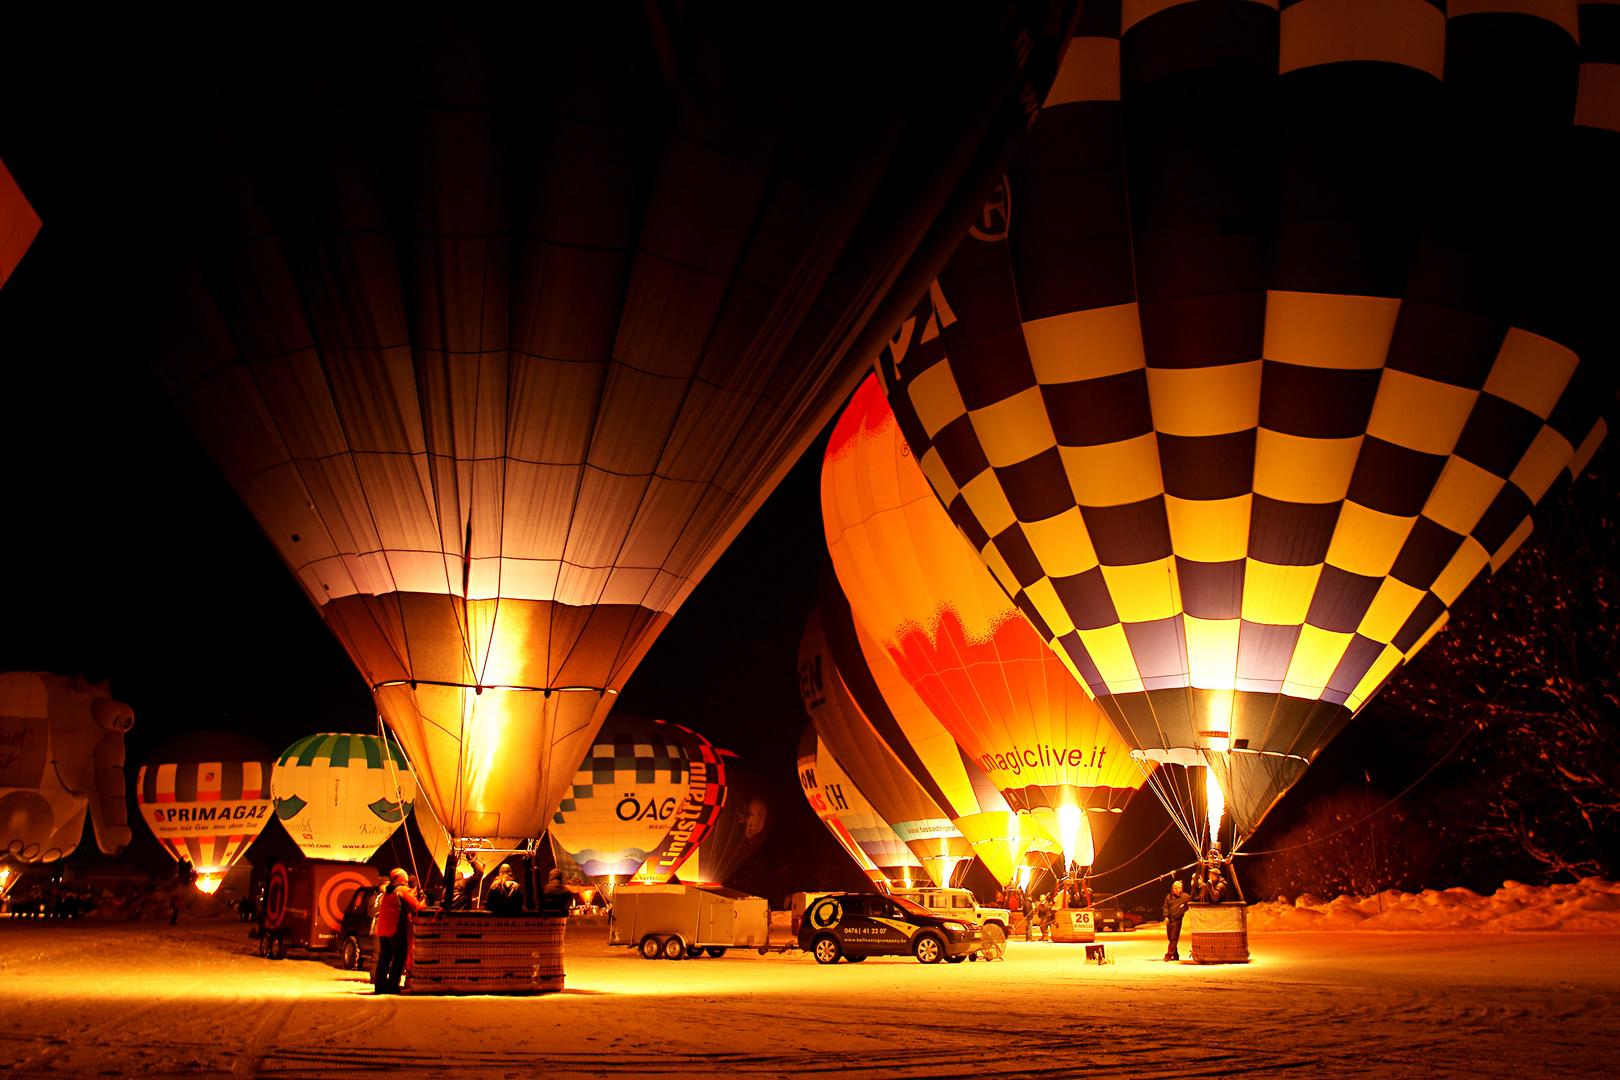 Ballooning / Walchsee 2011